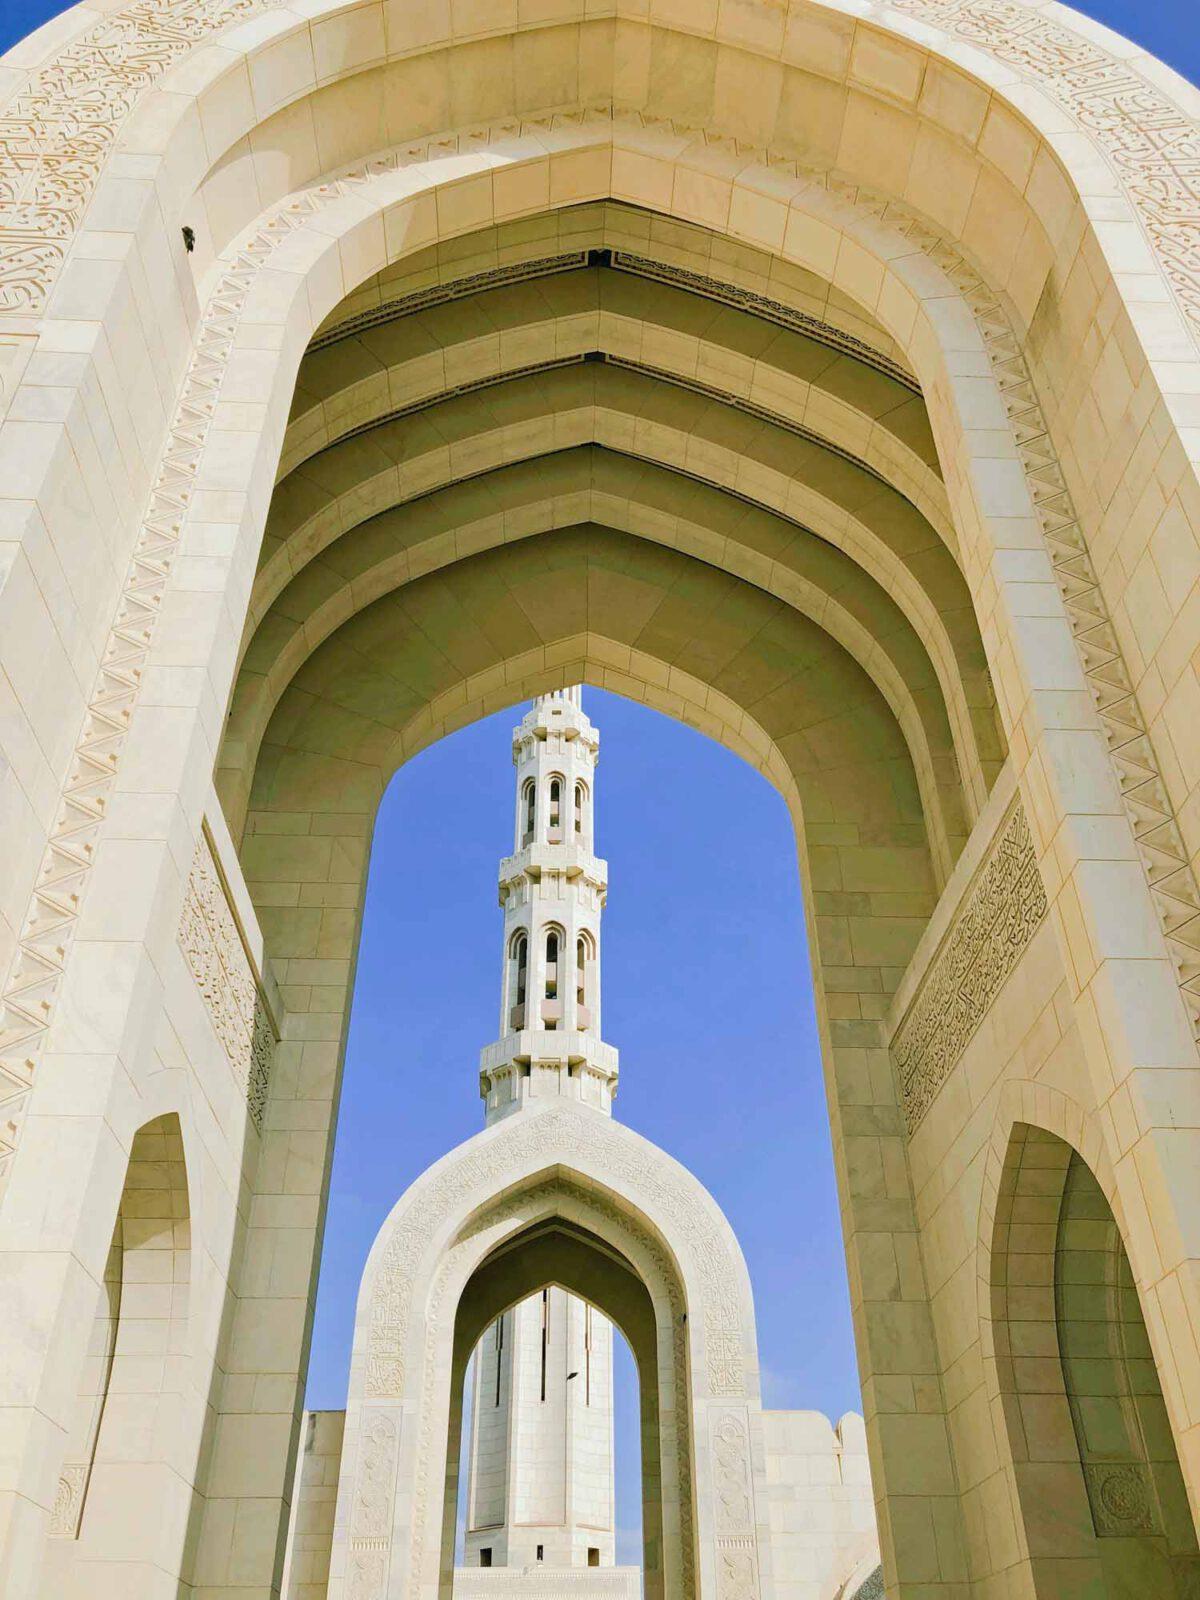 Kreuzfahrt: Landausflug in Muscat, Oman